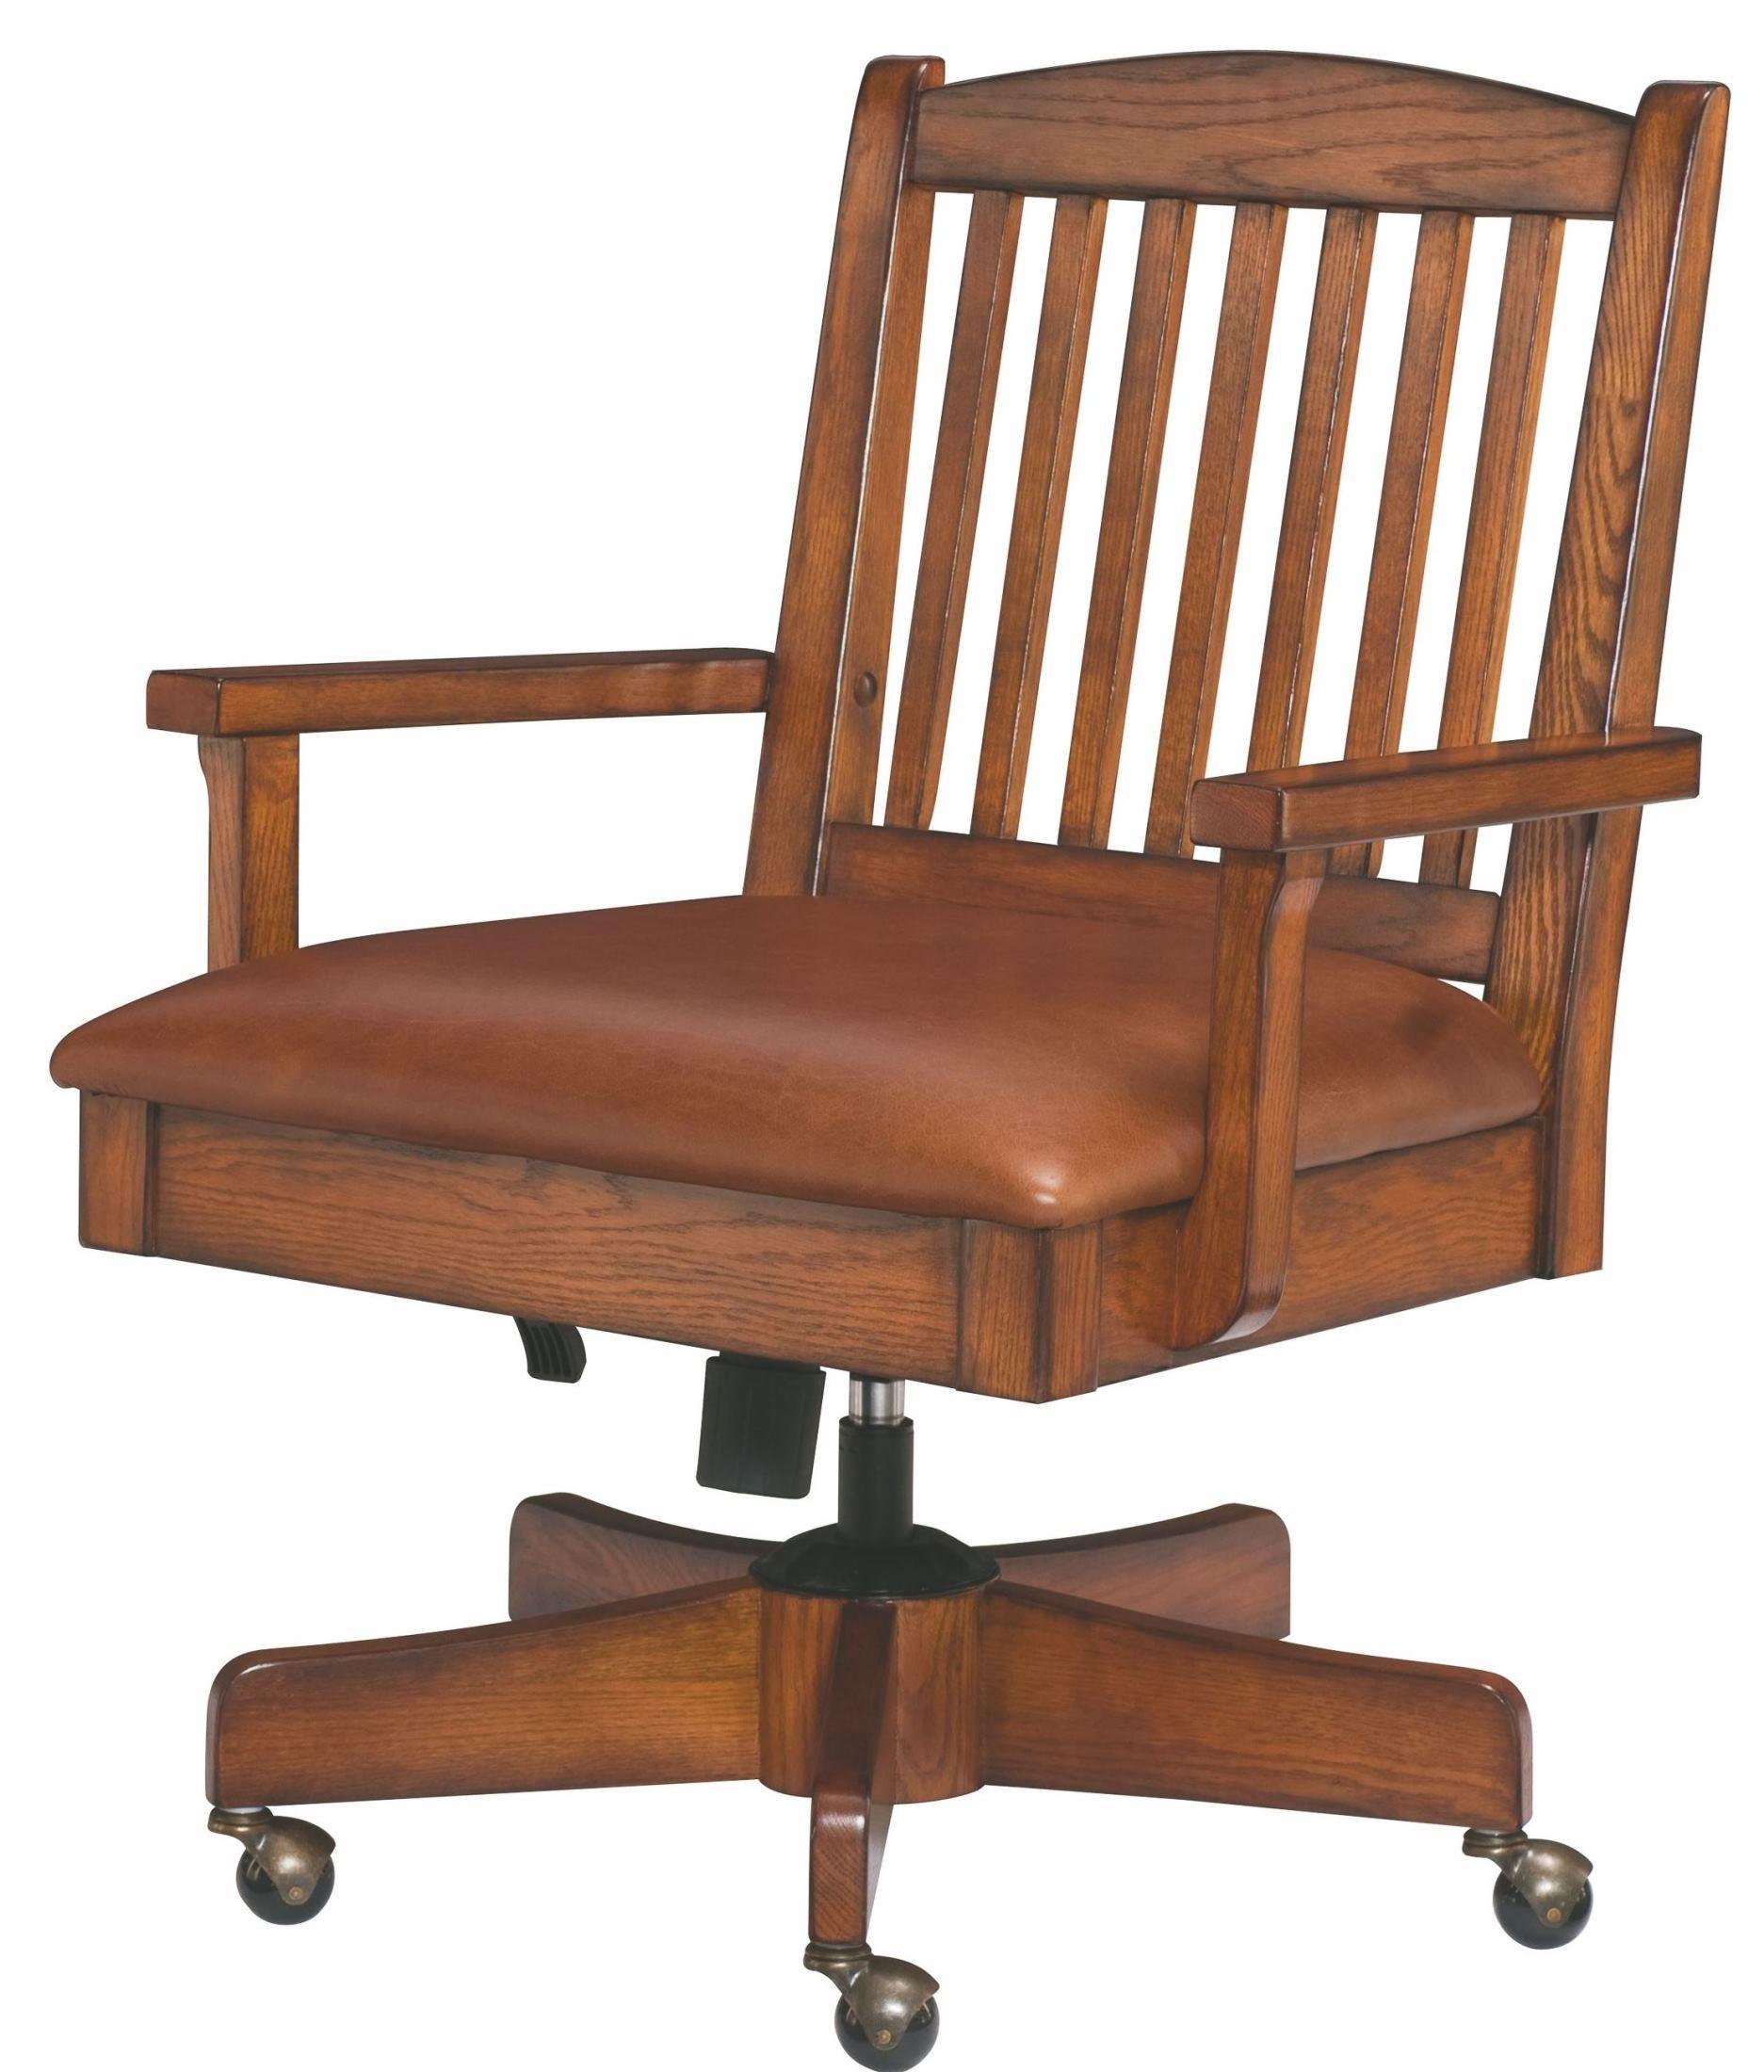 Sedona Mission Oak Desk Chair from Hammary T T 00